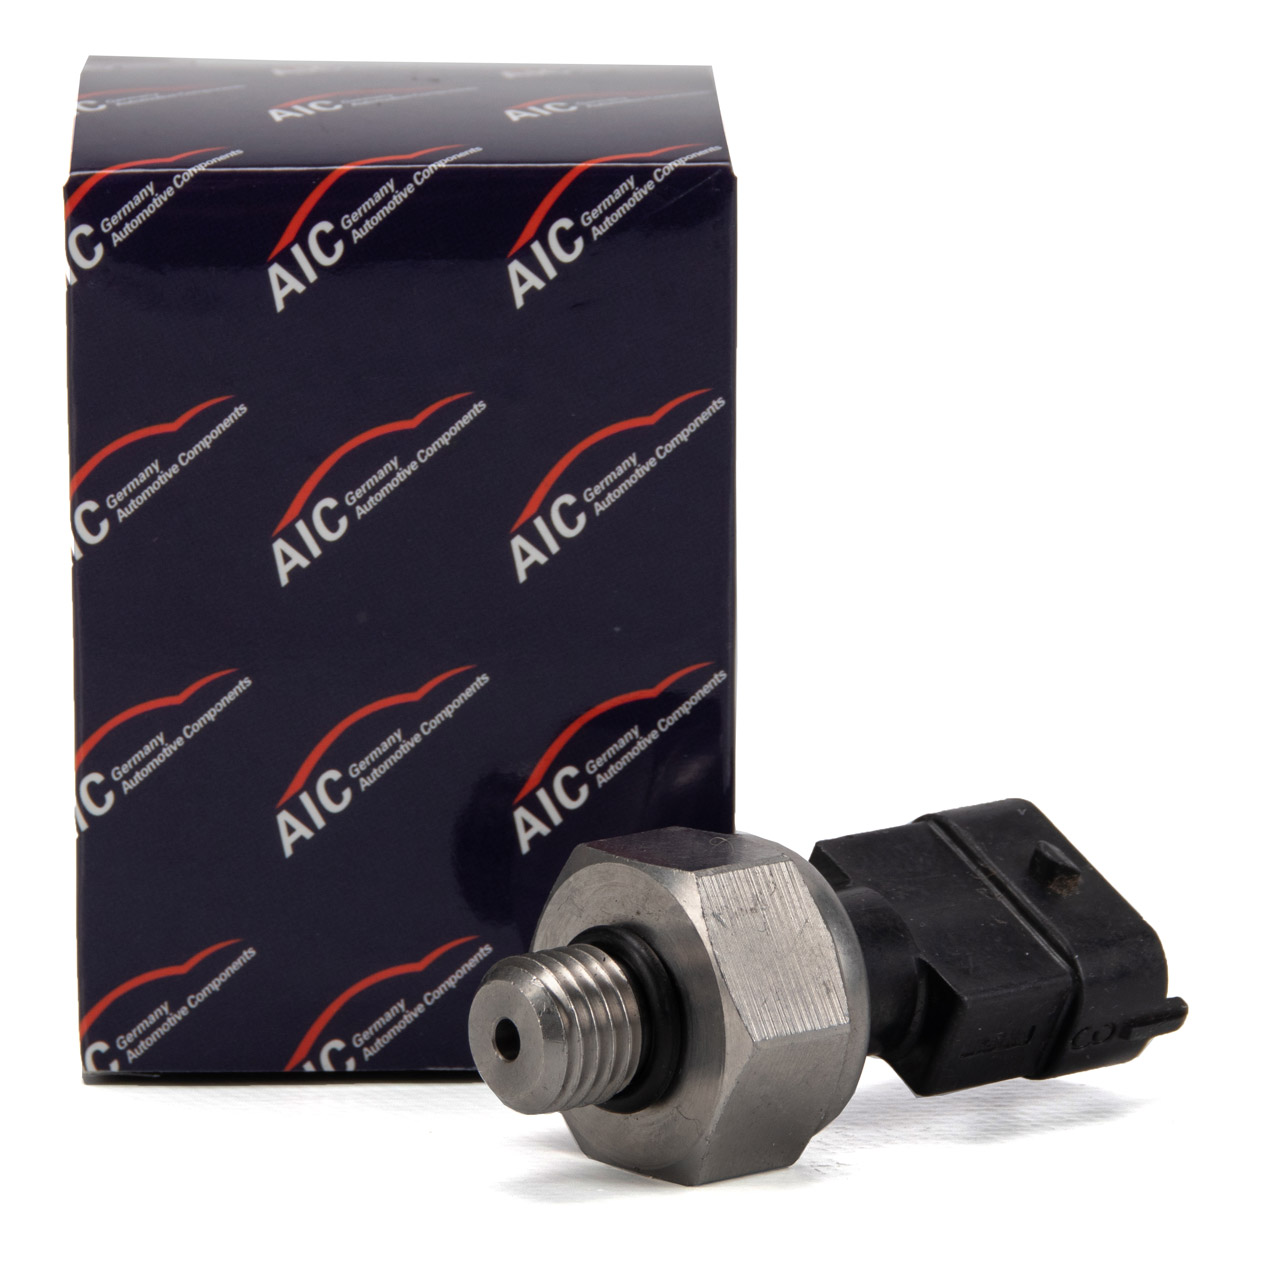 AIC Sensor Kraftstoffdruck + Dichtung OPEL Signum Vectra C + CC Zafira B 2.2 6235649